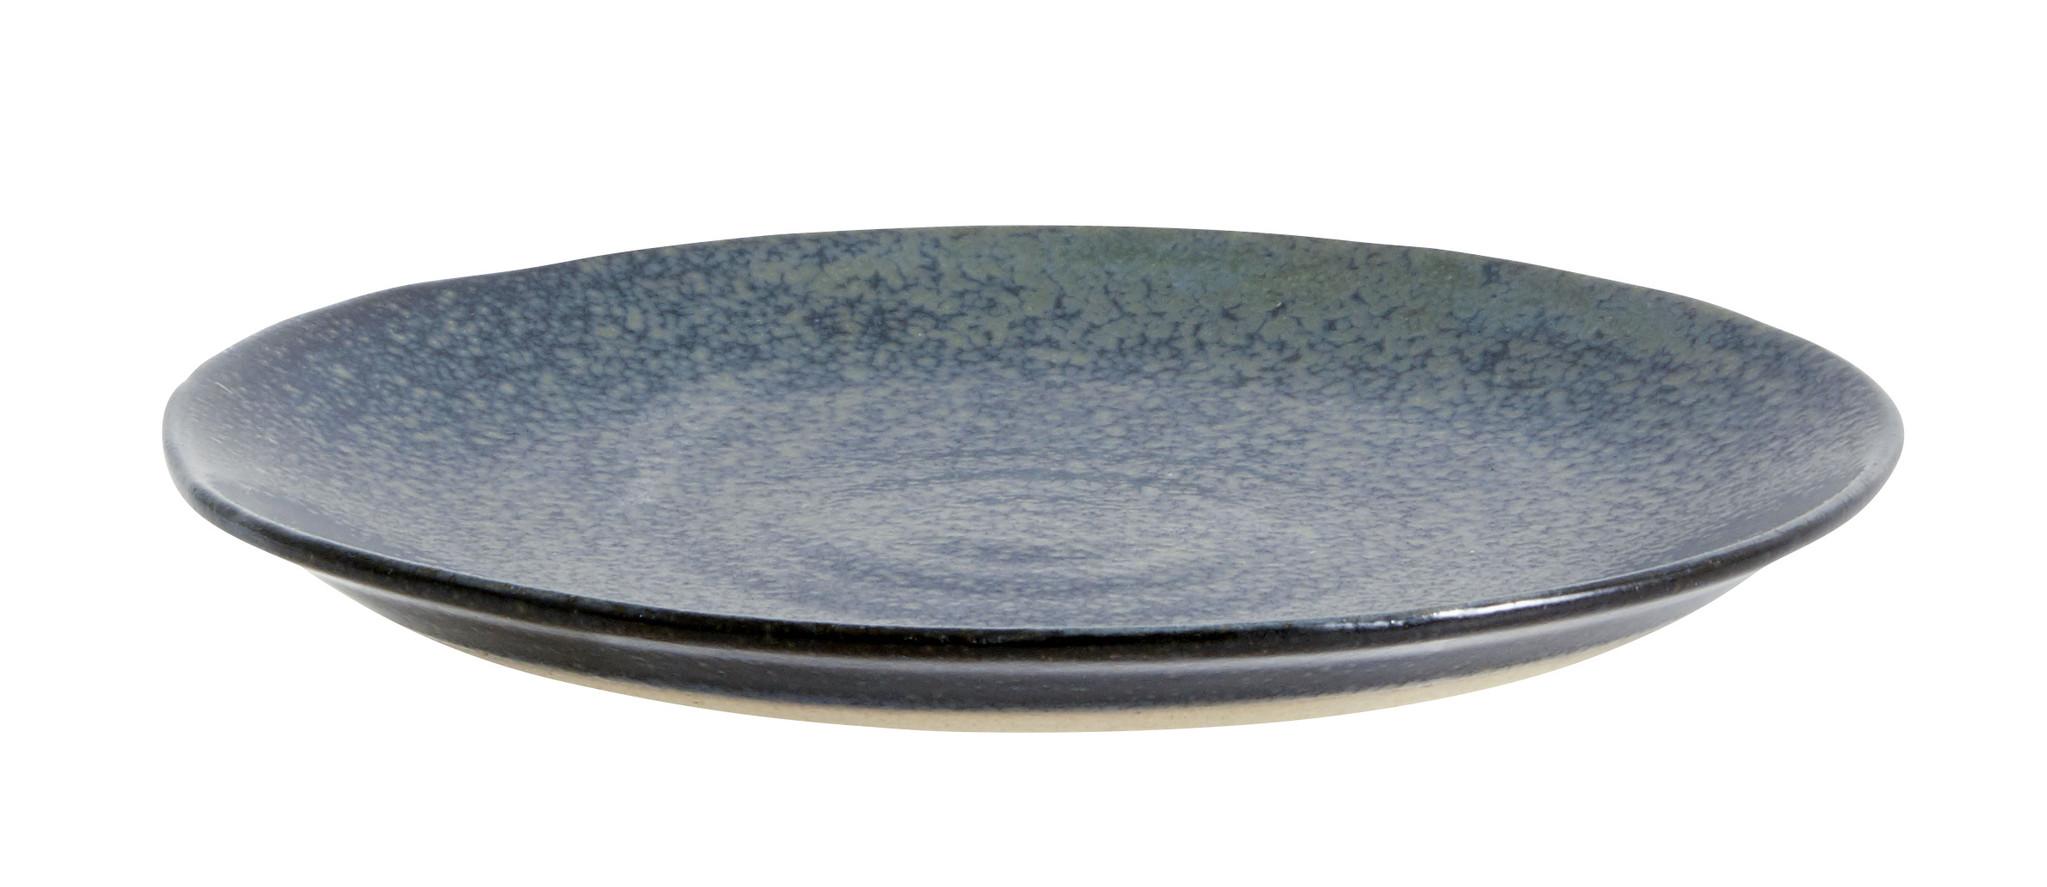 Nordal Grainy gebaksbord - donkerblauw - set van 4-57013-5708309157917